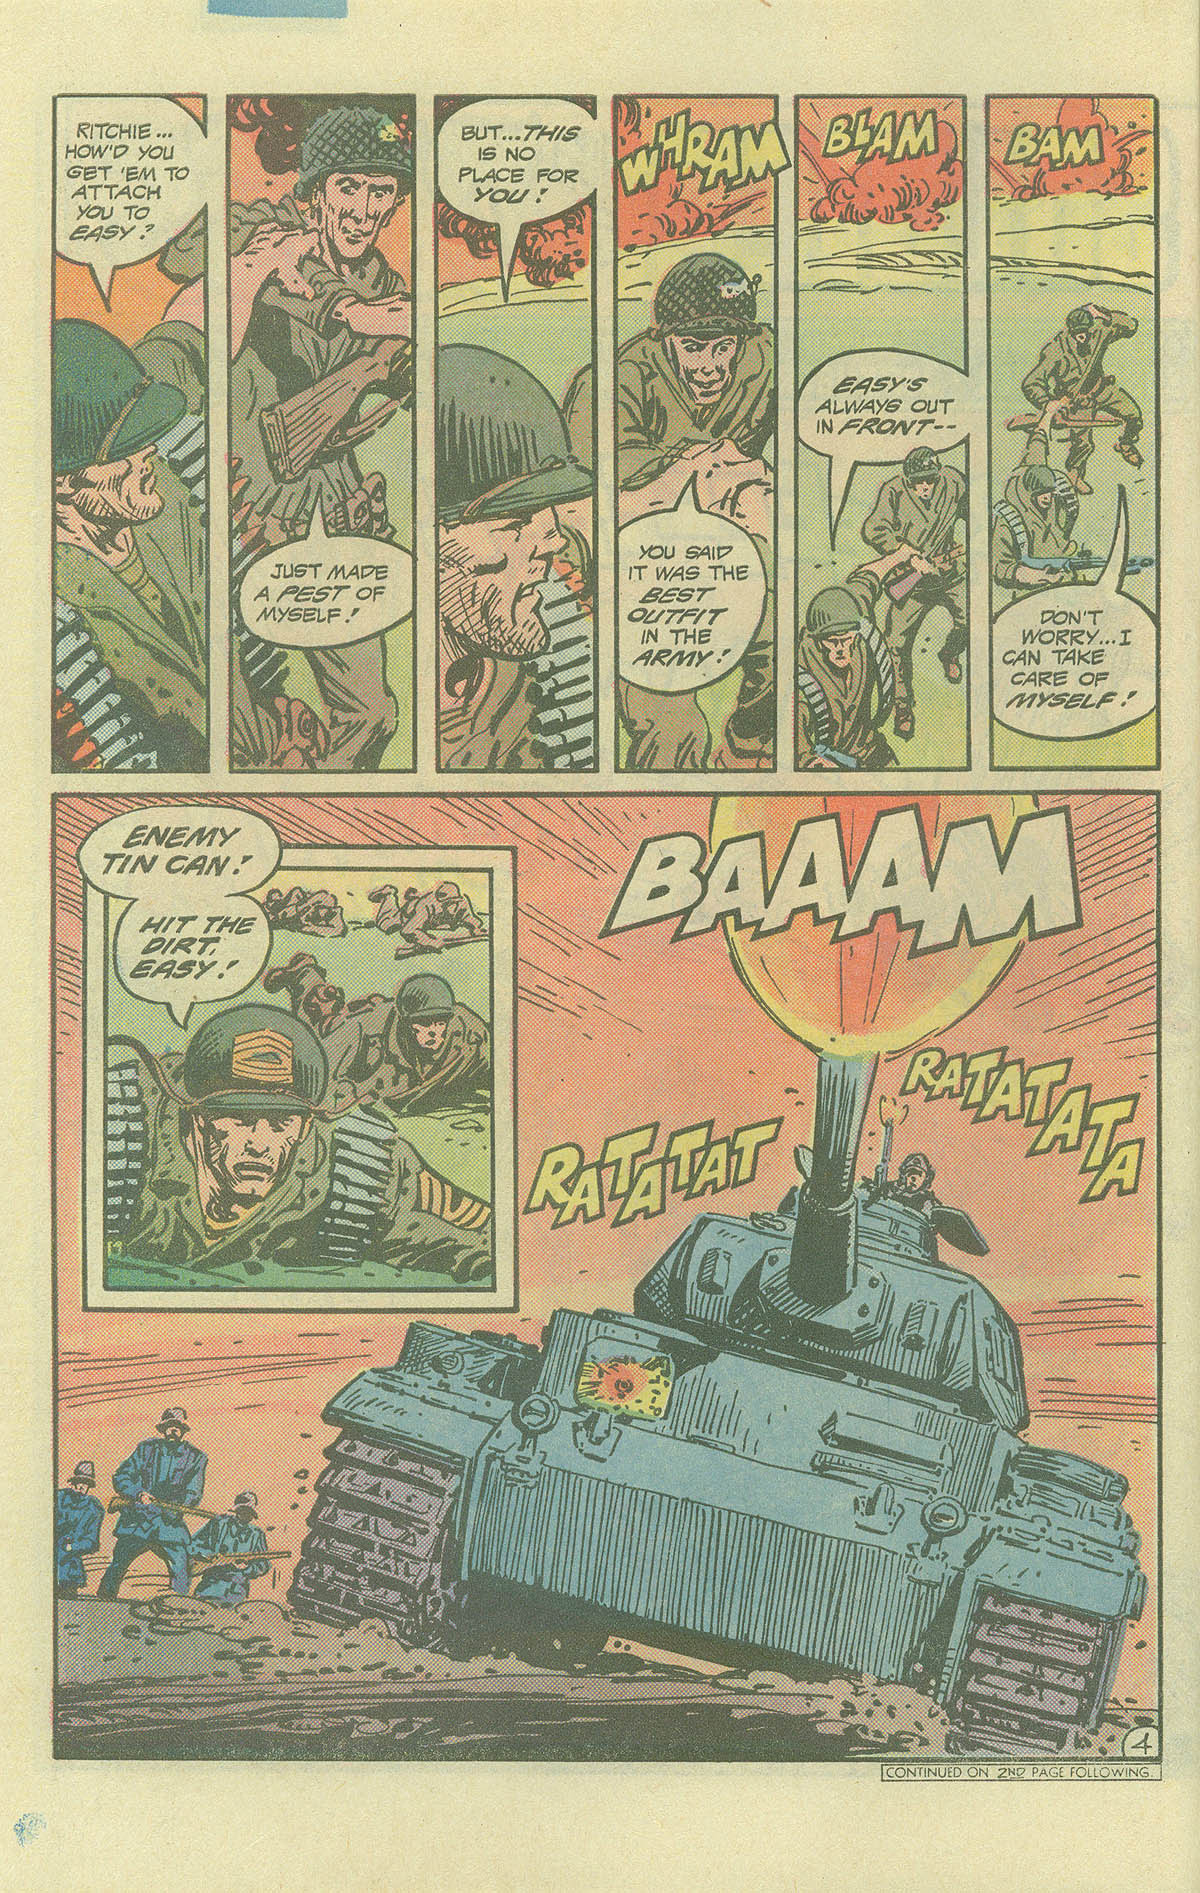 Read online Sgt. Rock comic -  Issue #393 - 4